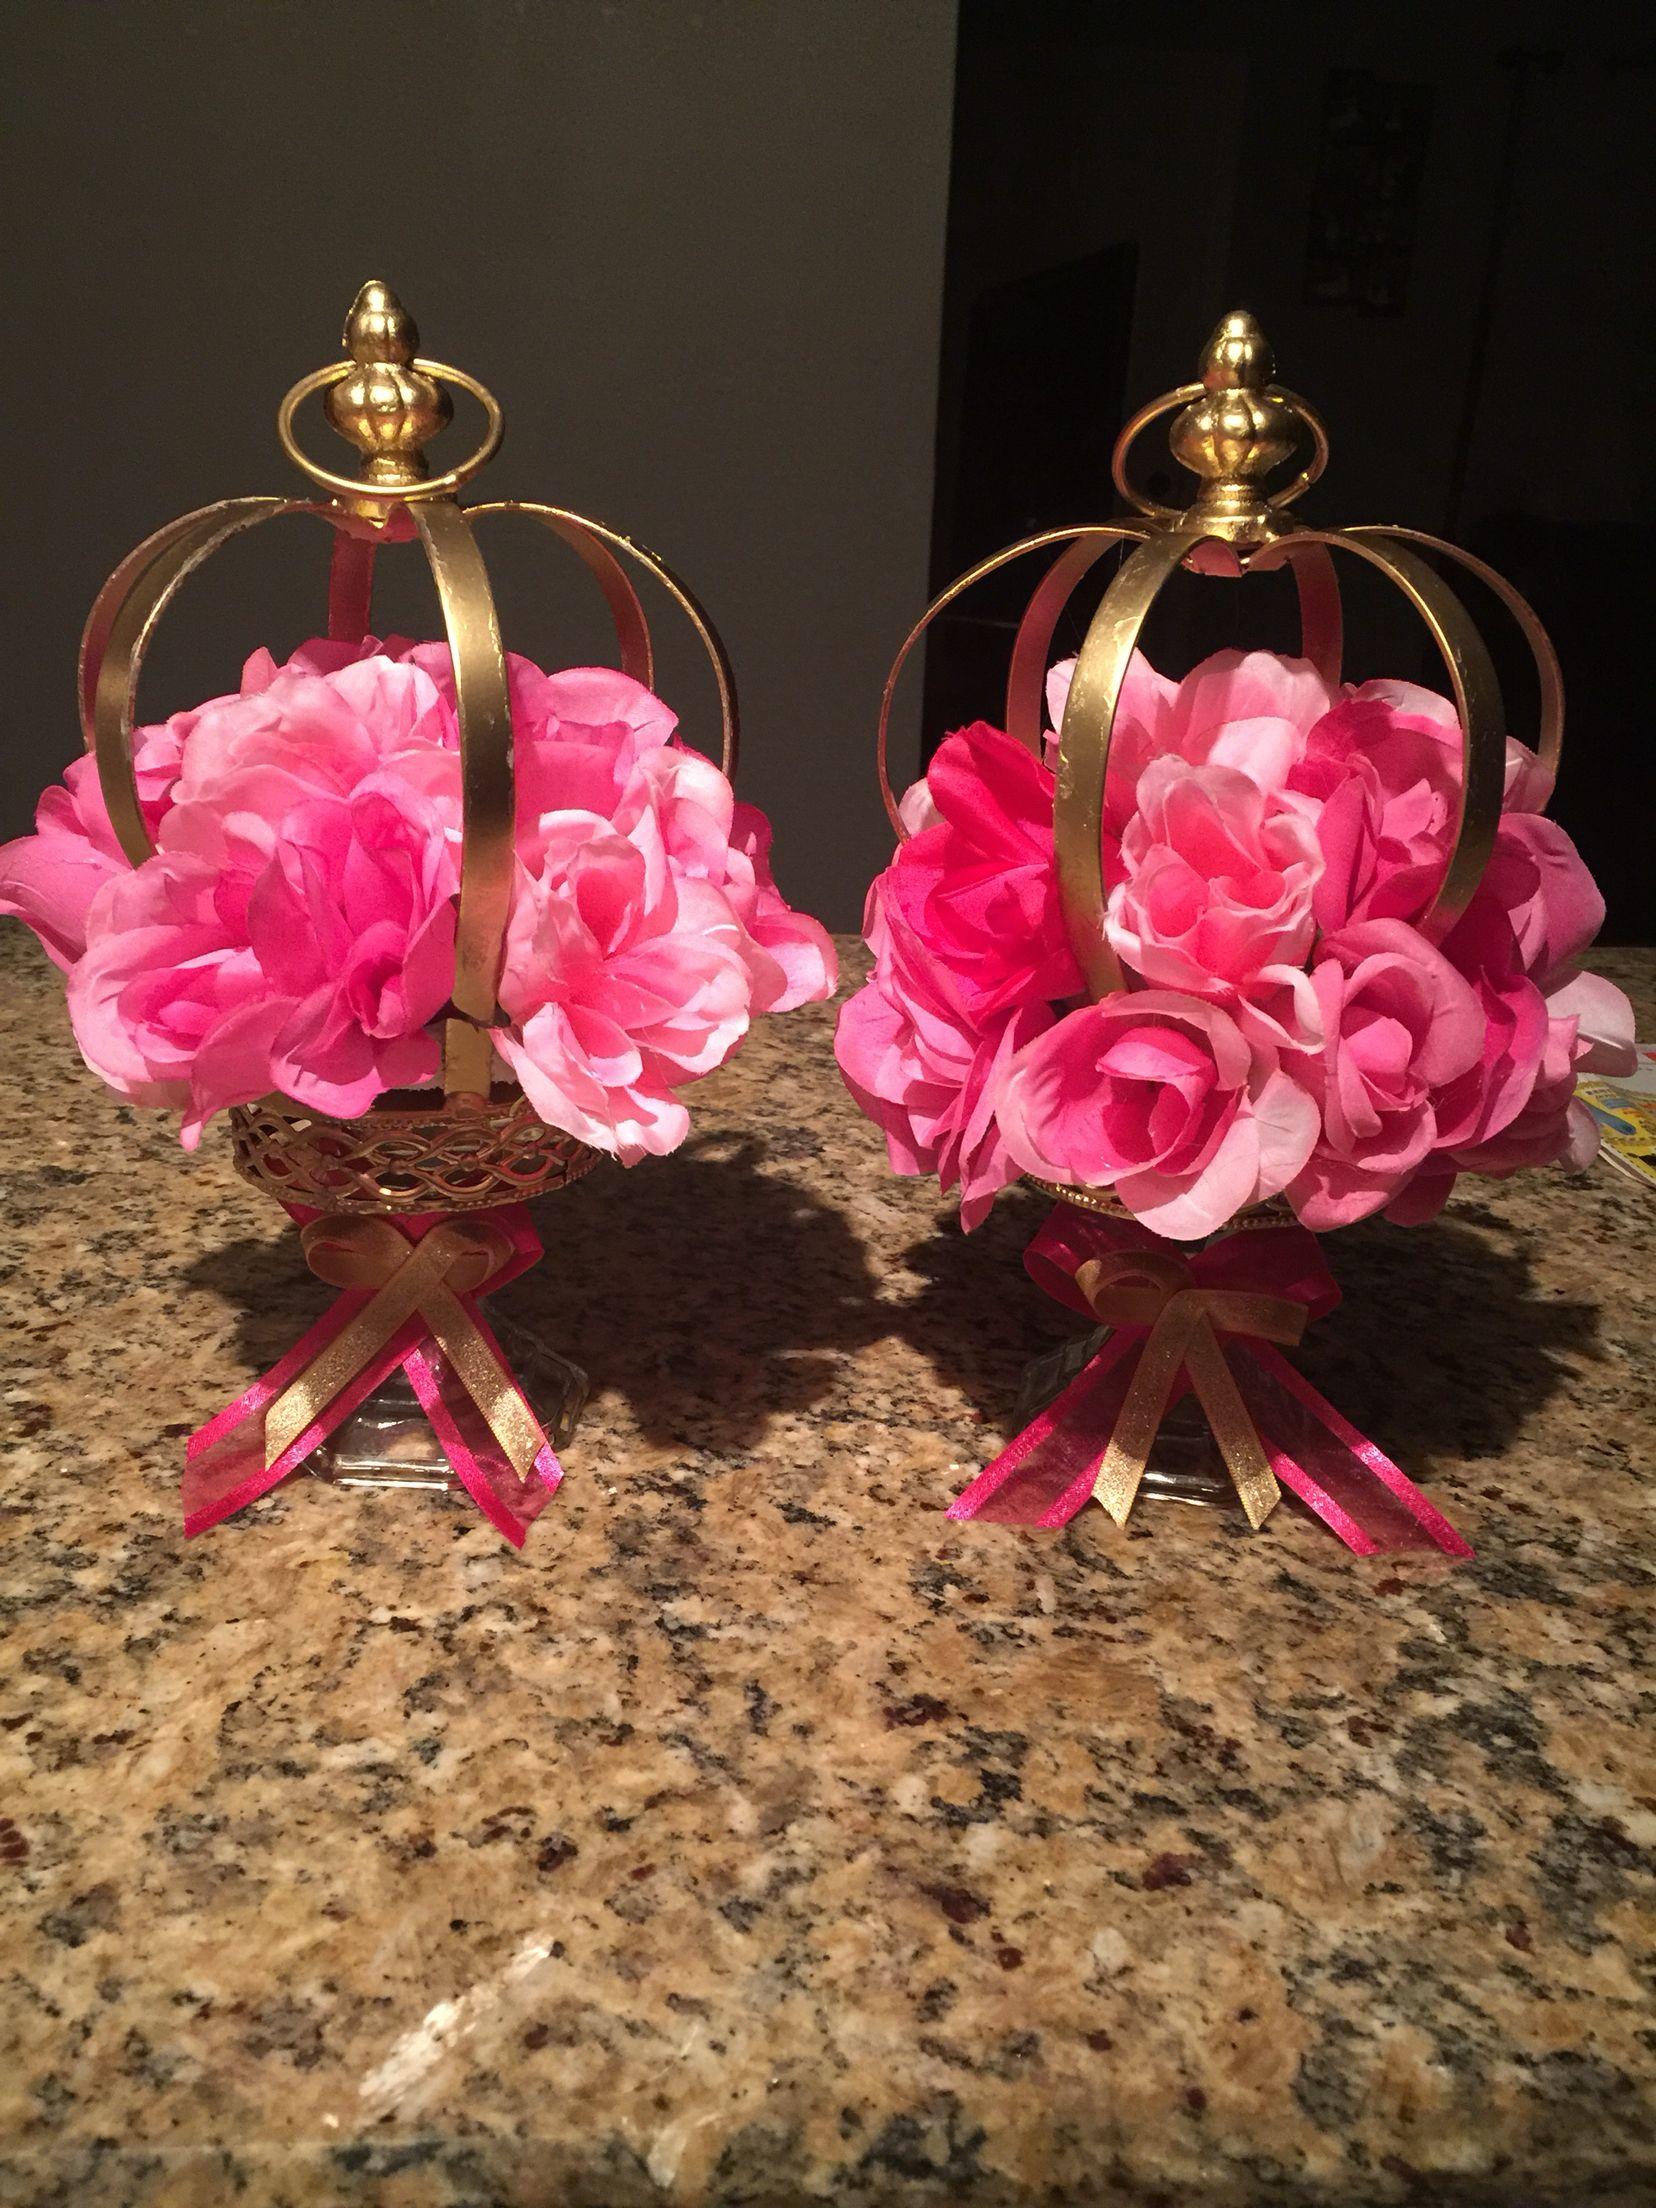 Crown Centerpieces Princess Theme Centerpieces Pink and ...